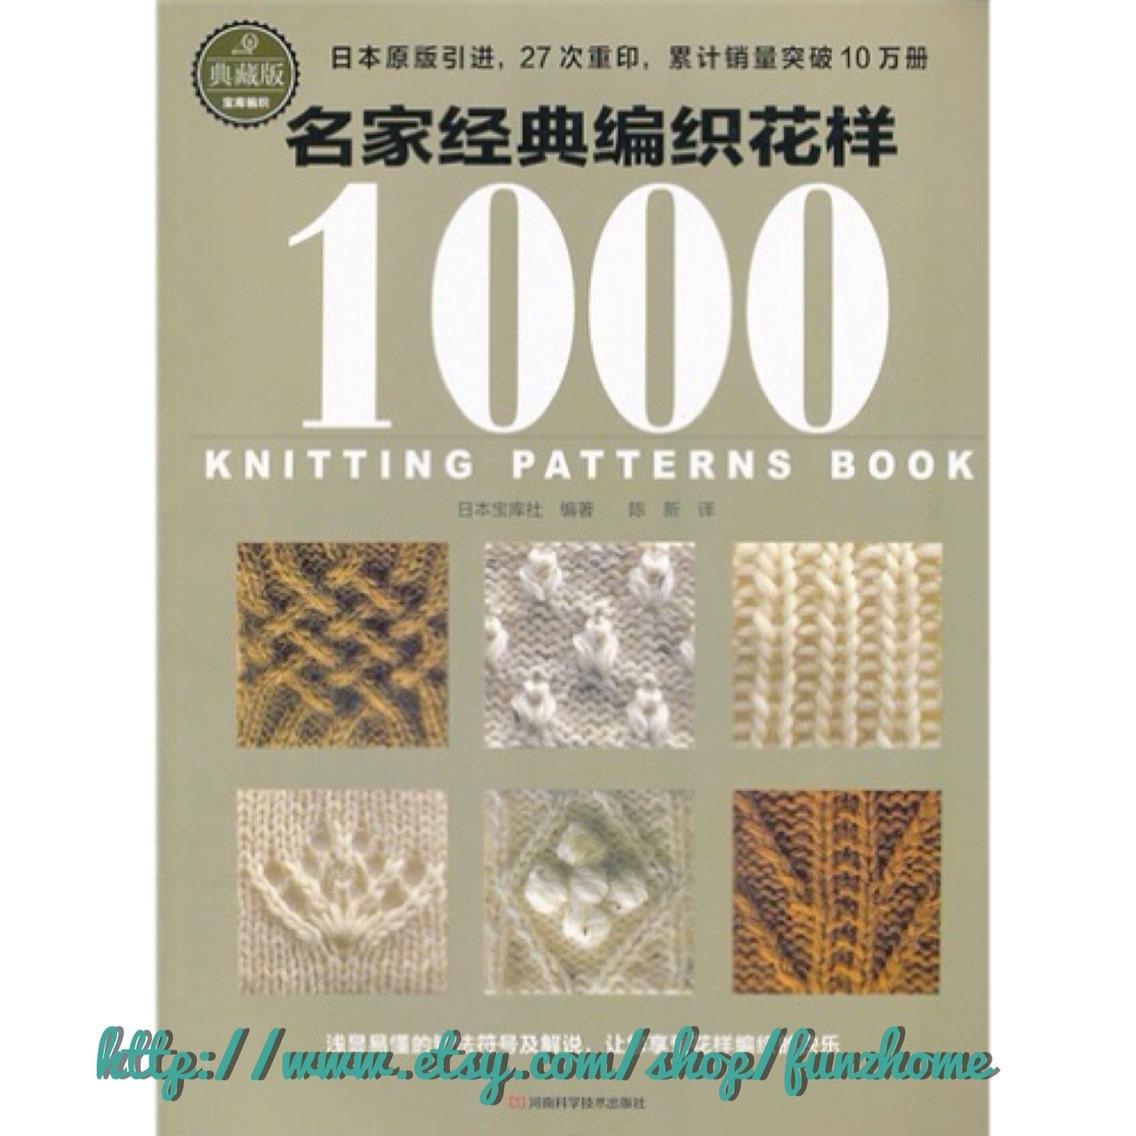 Chinese Knitting Patterns : Japanese Knitting Patterns 1000 Chinese Version Handmade